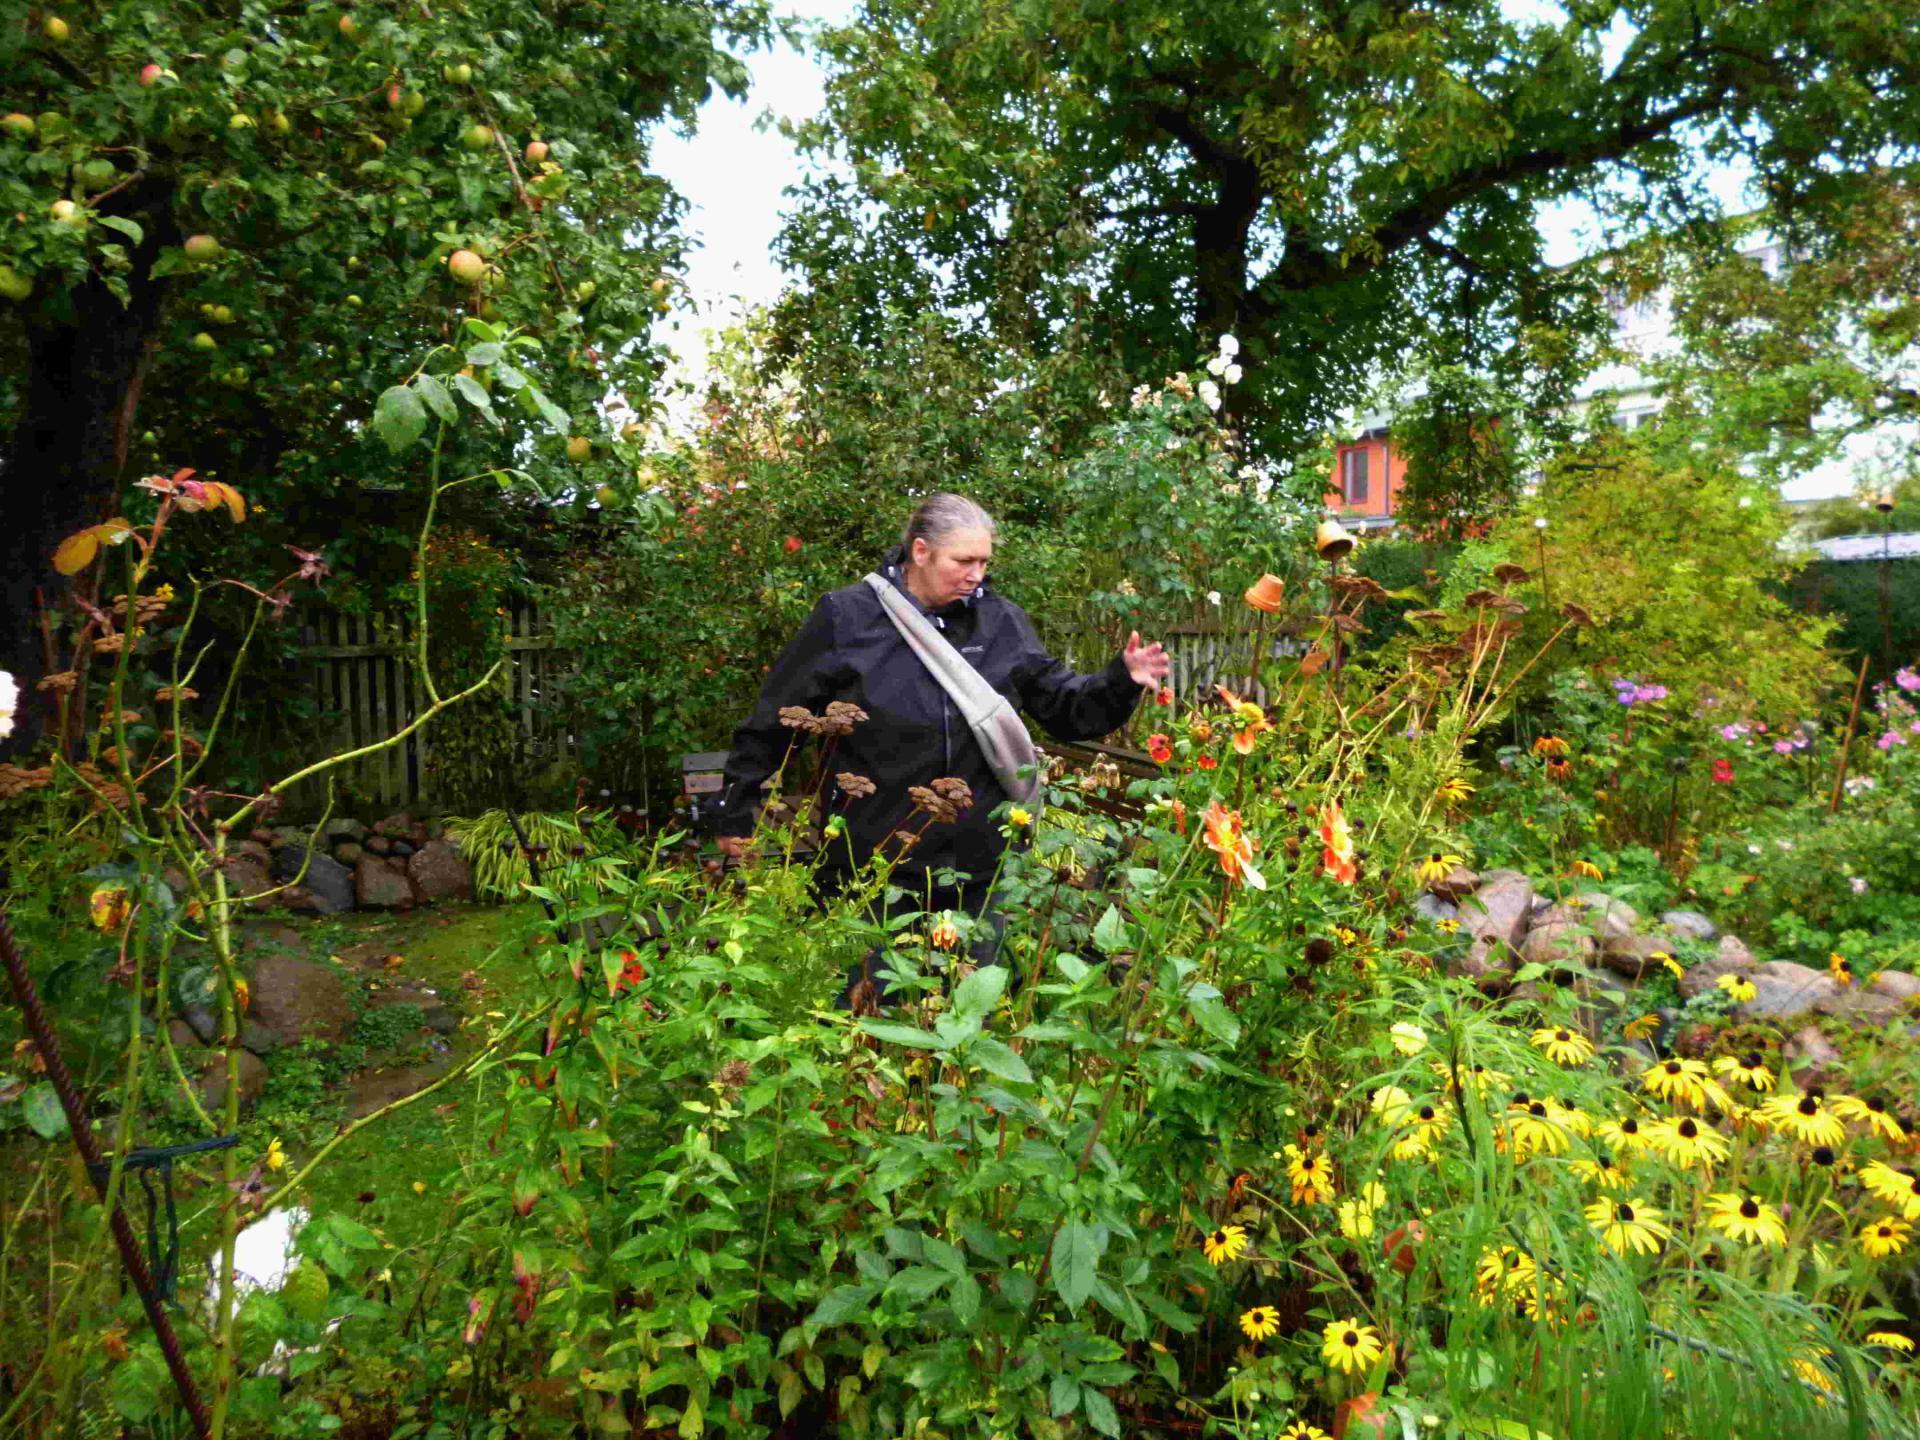 Offene Gartenpfporte 26-09-2020 Bild 08